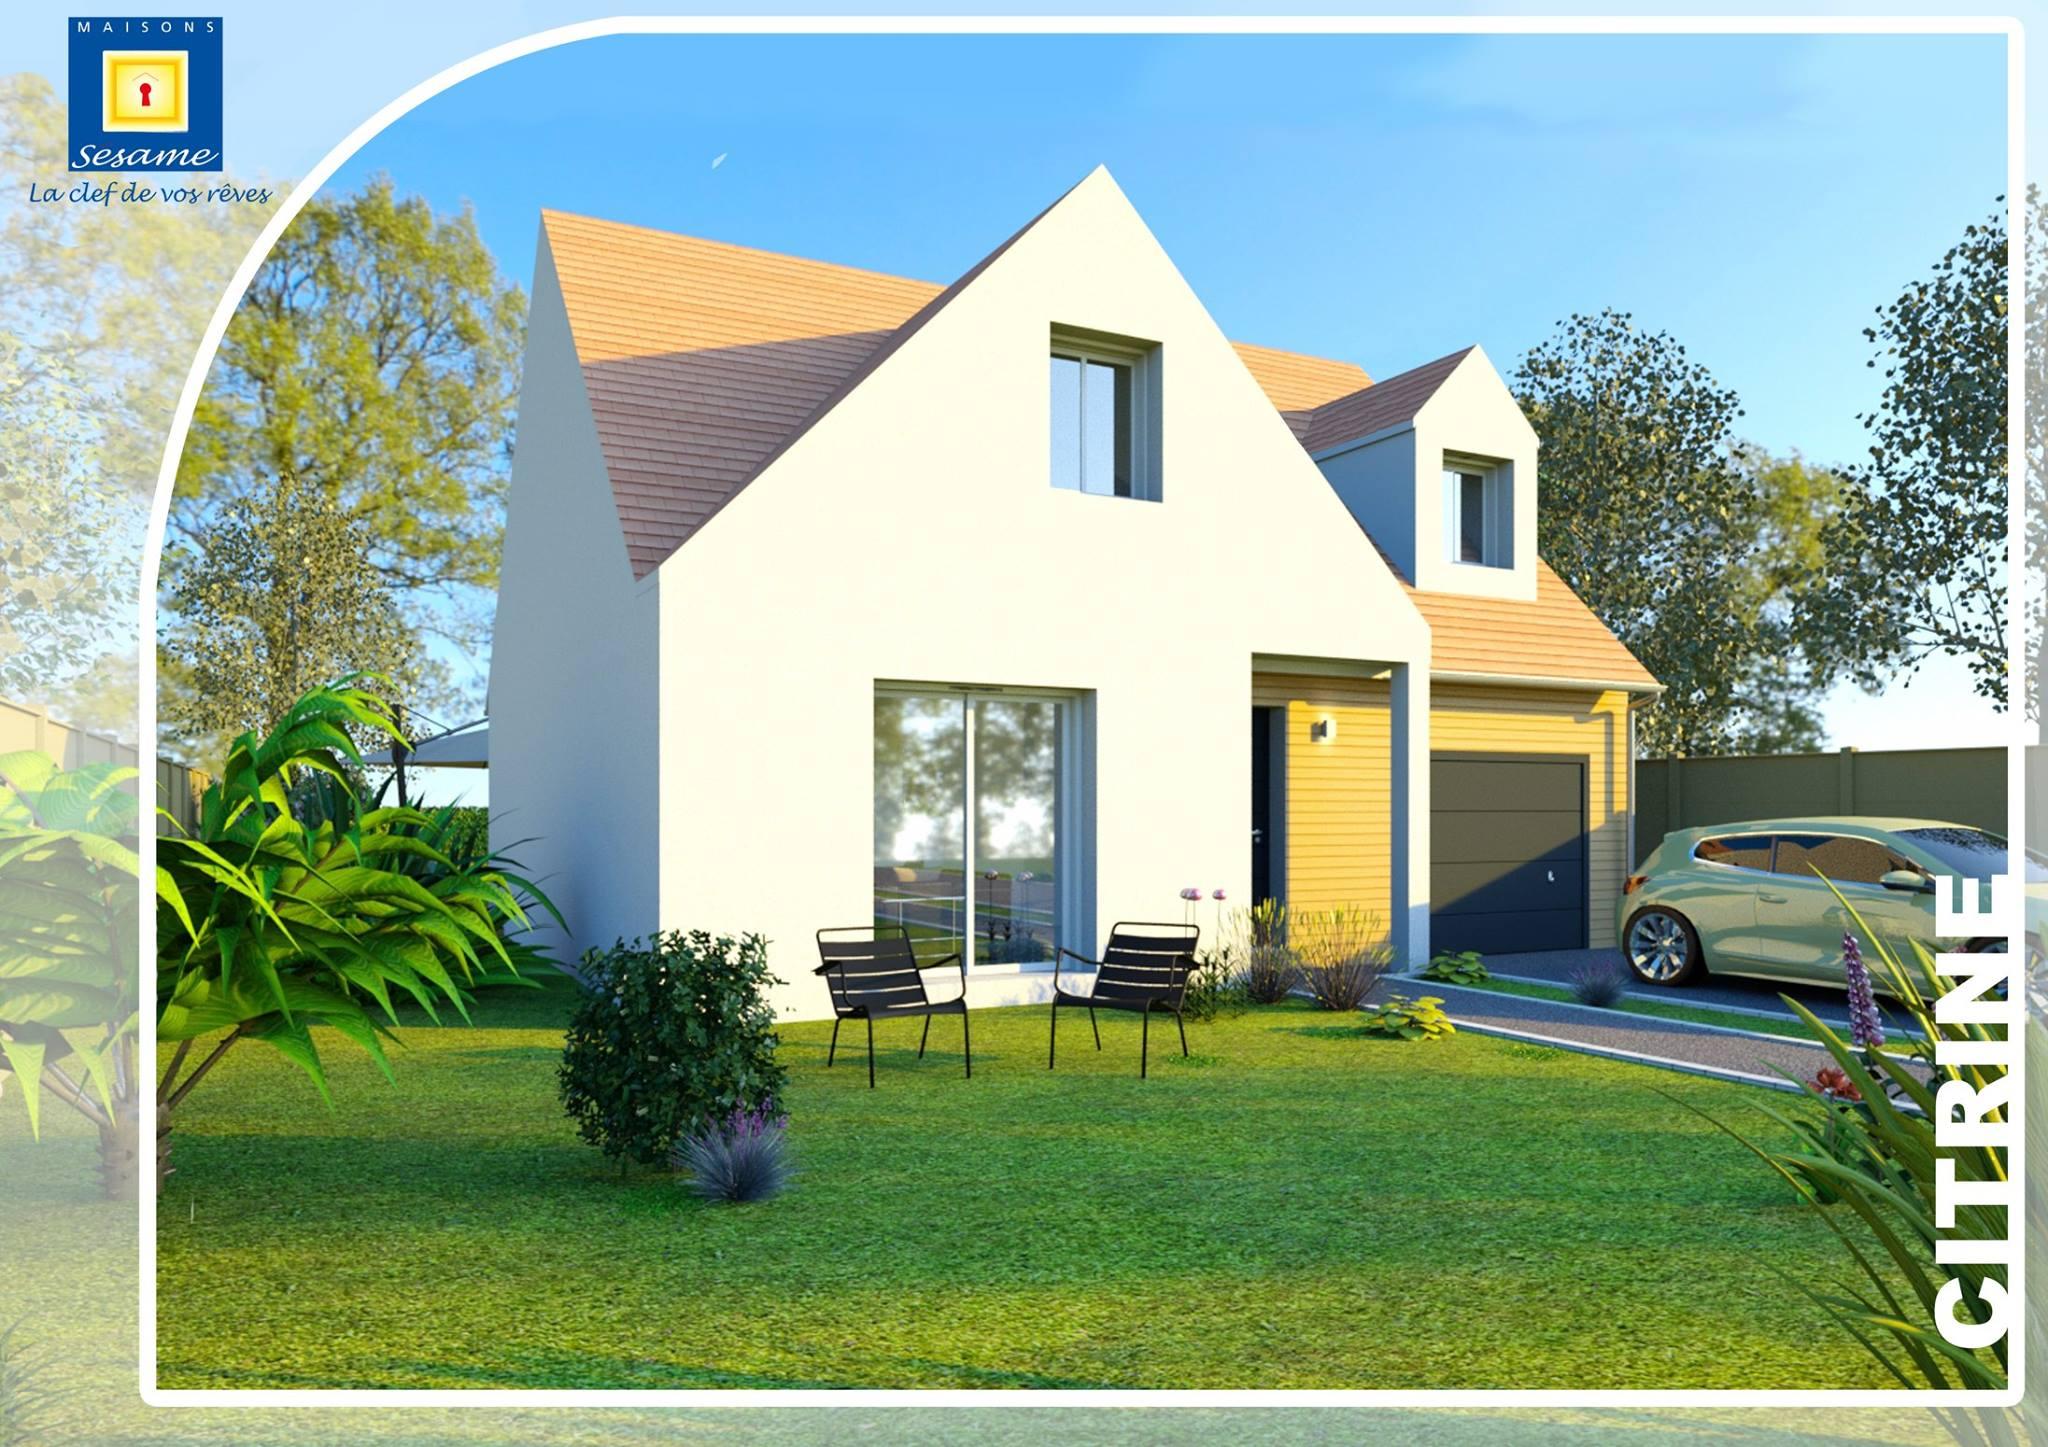 Citrine, la petite maison spacieuse de Maisons Sesame - Ma Future Maison